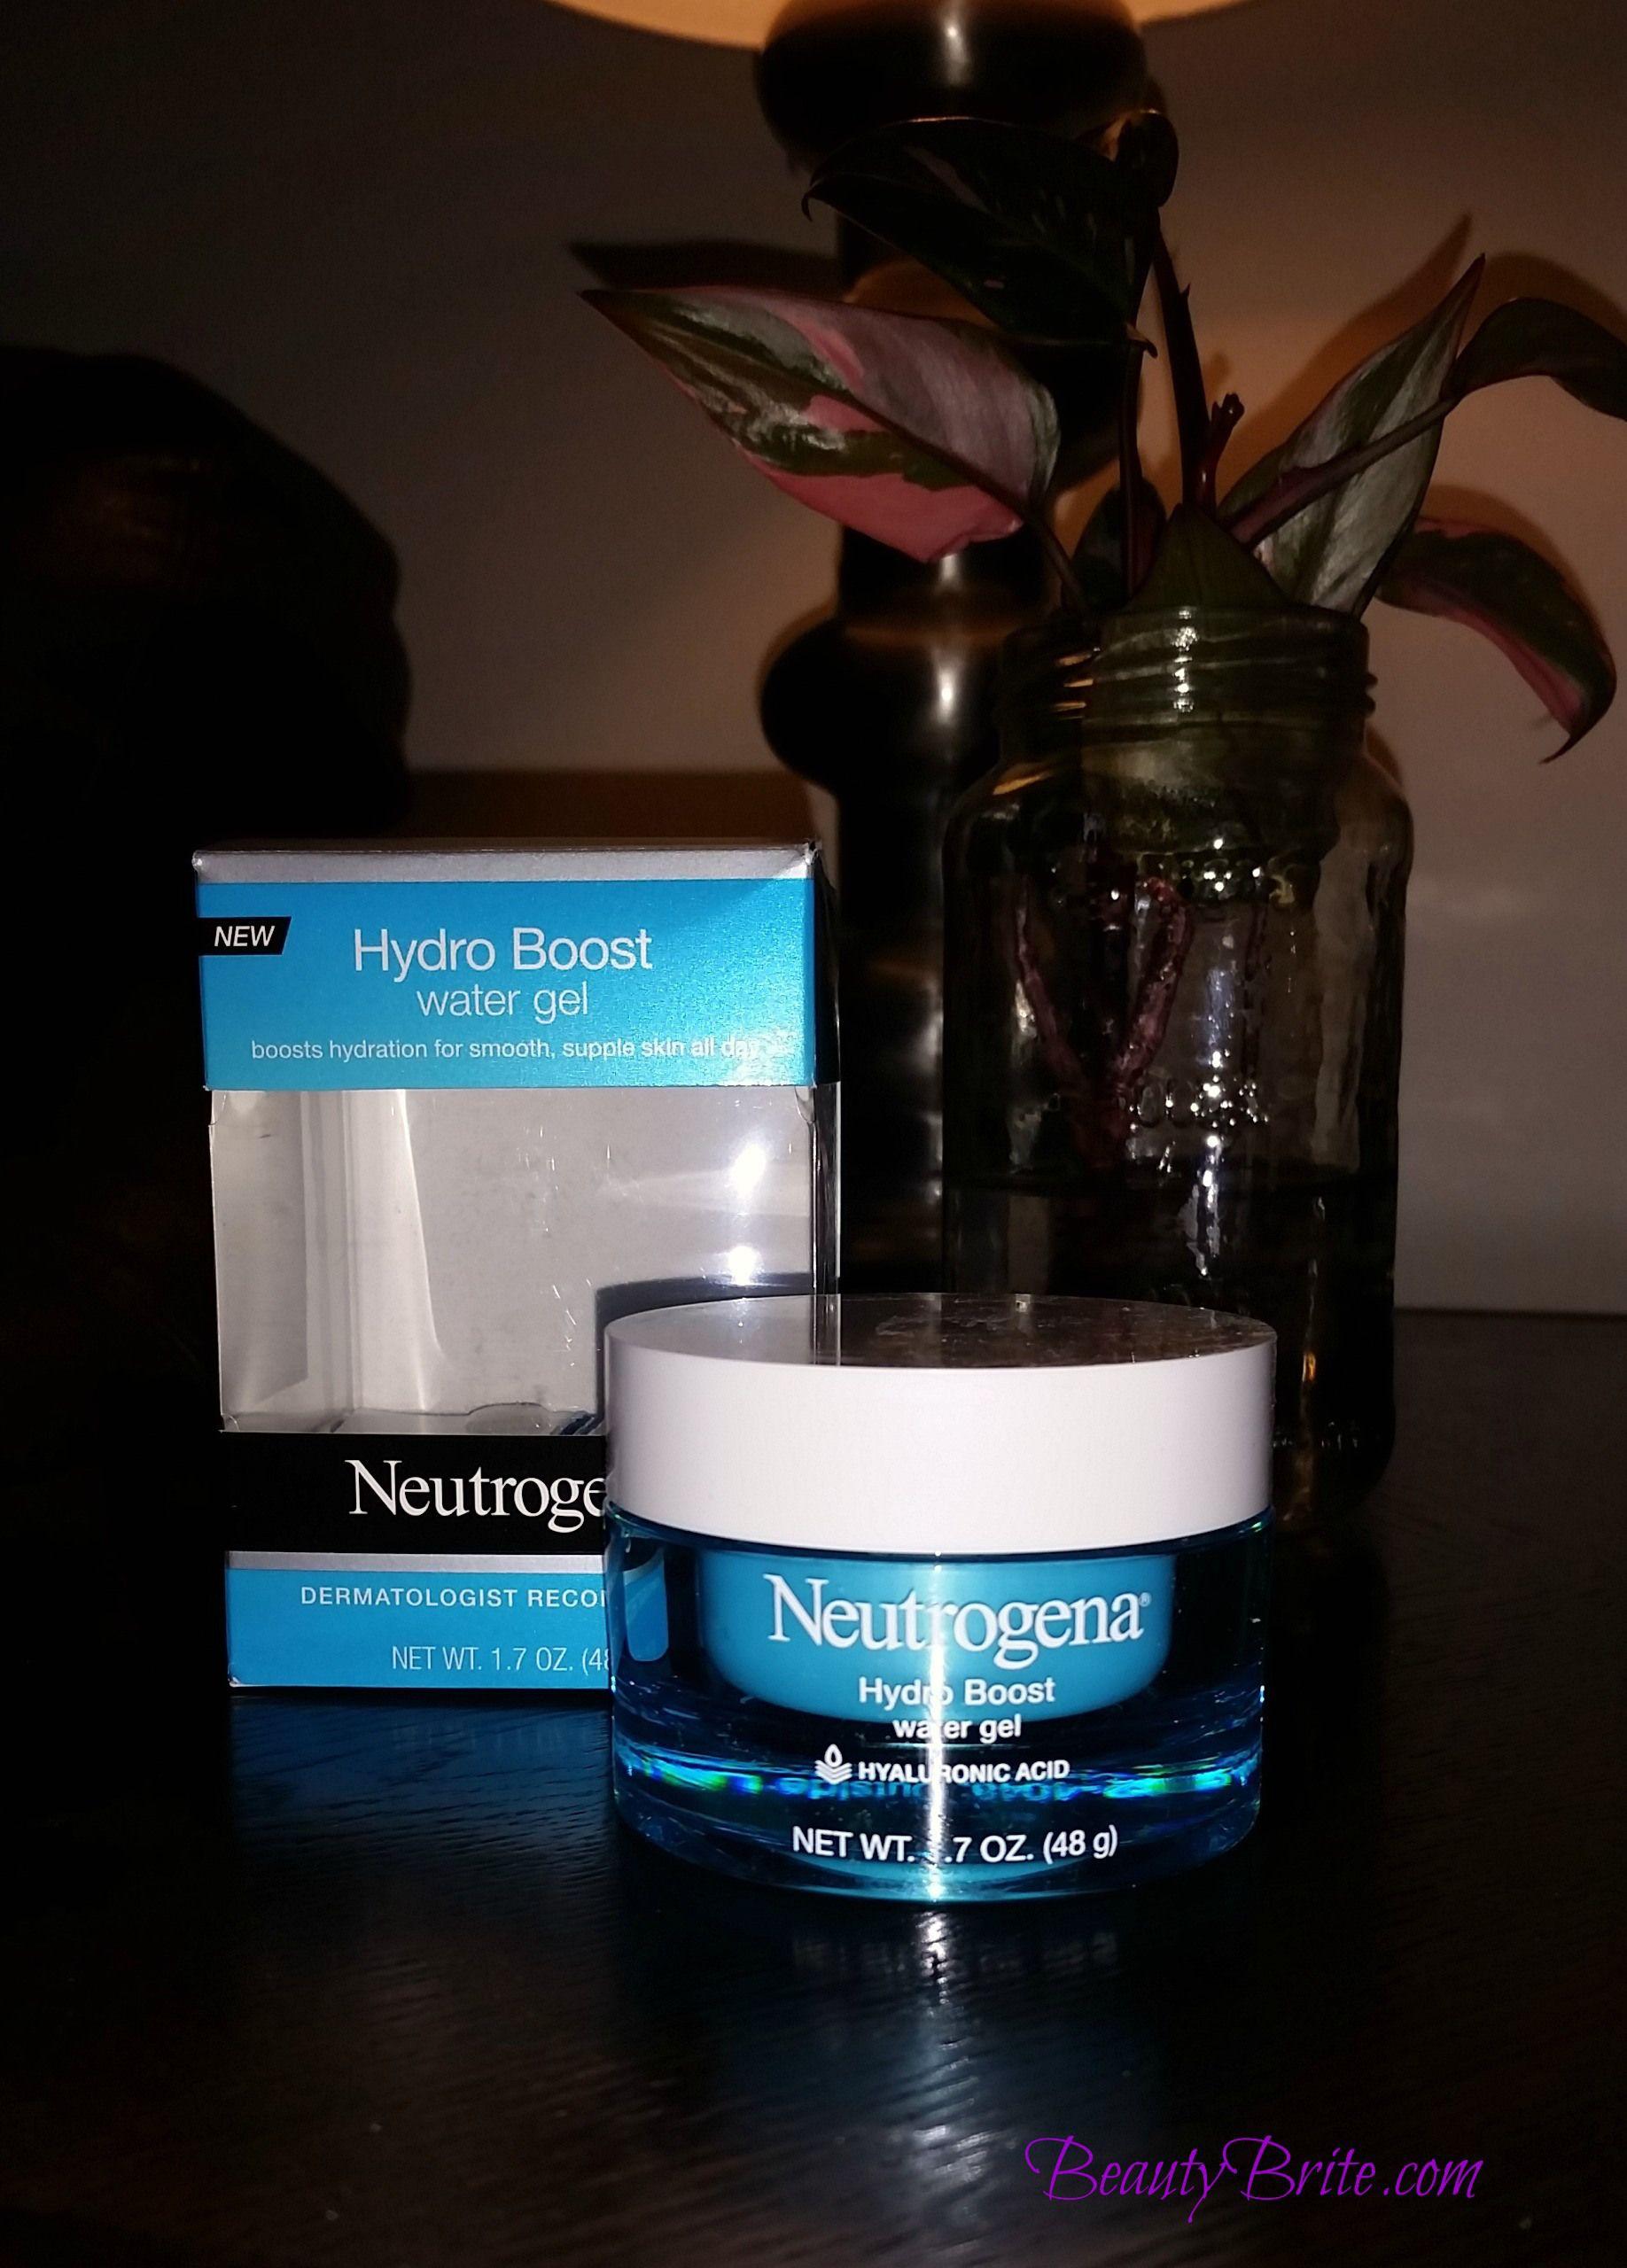 Review Beauty Brite Neutrogena Hydro Boost Neutrogena Gel